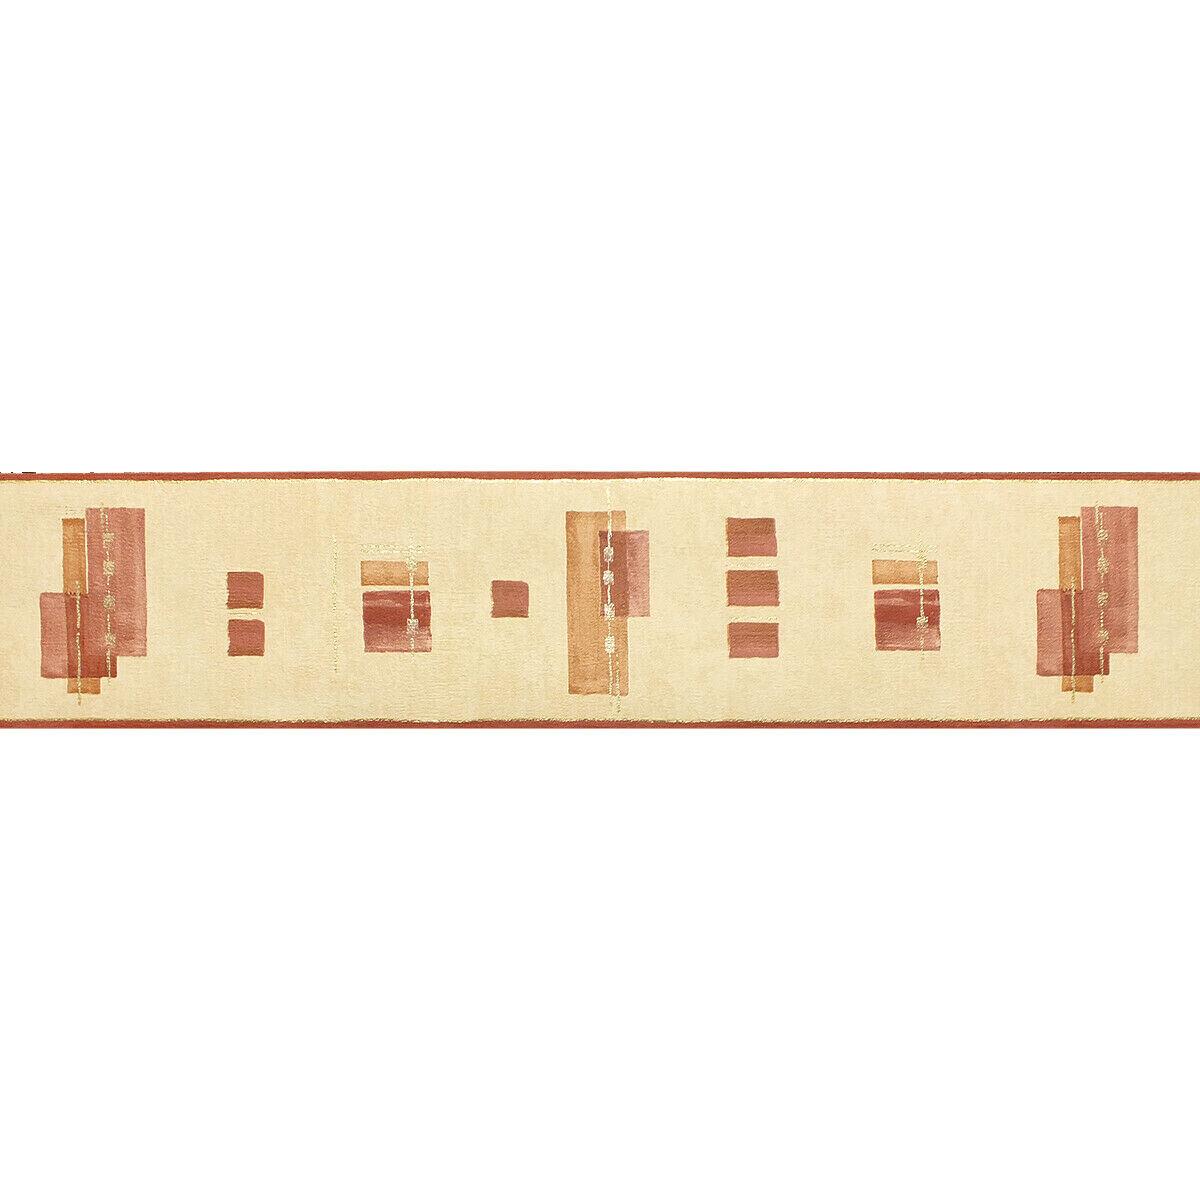 13.2cm wide 5m long Red Textured Vinyl Wallpaper Border Modern Block Design